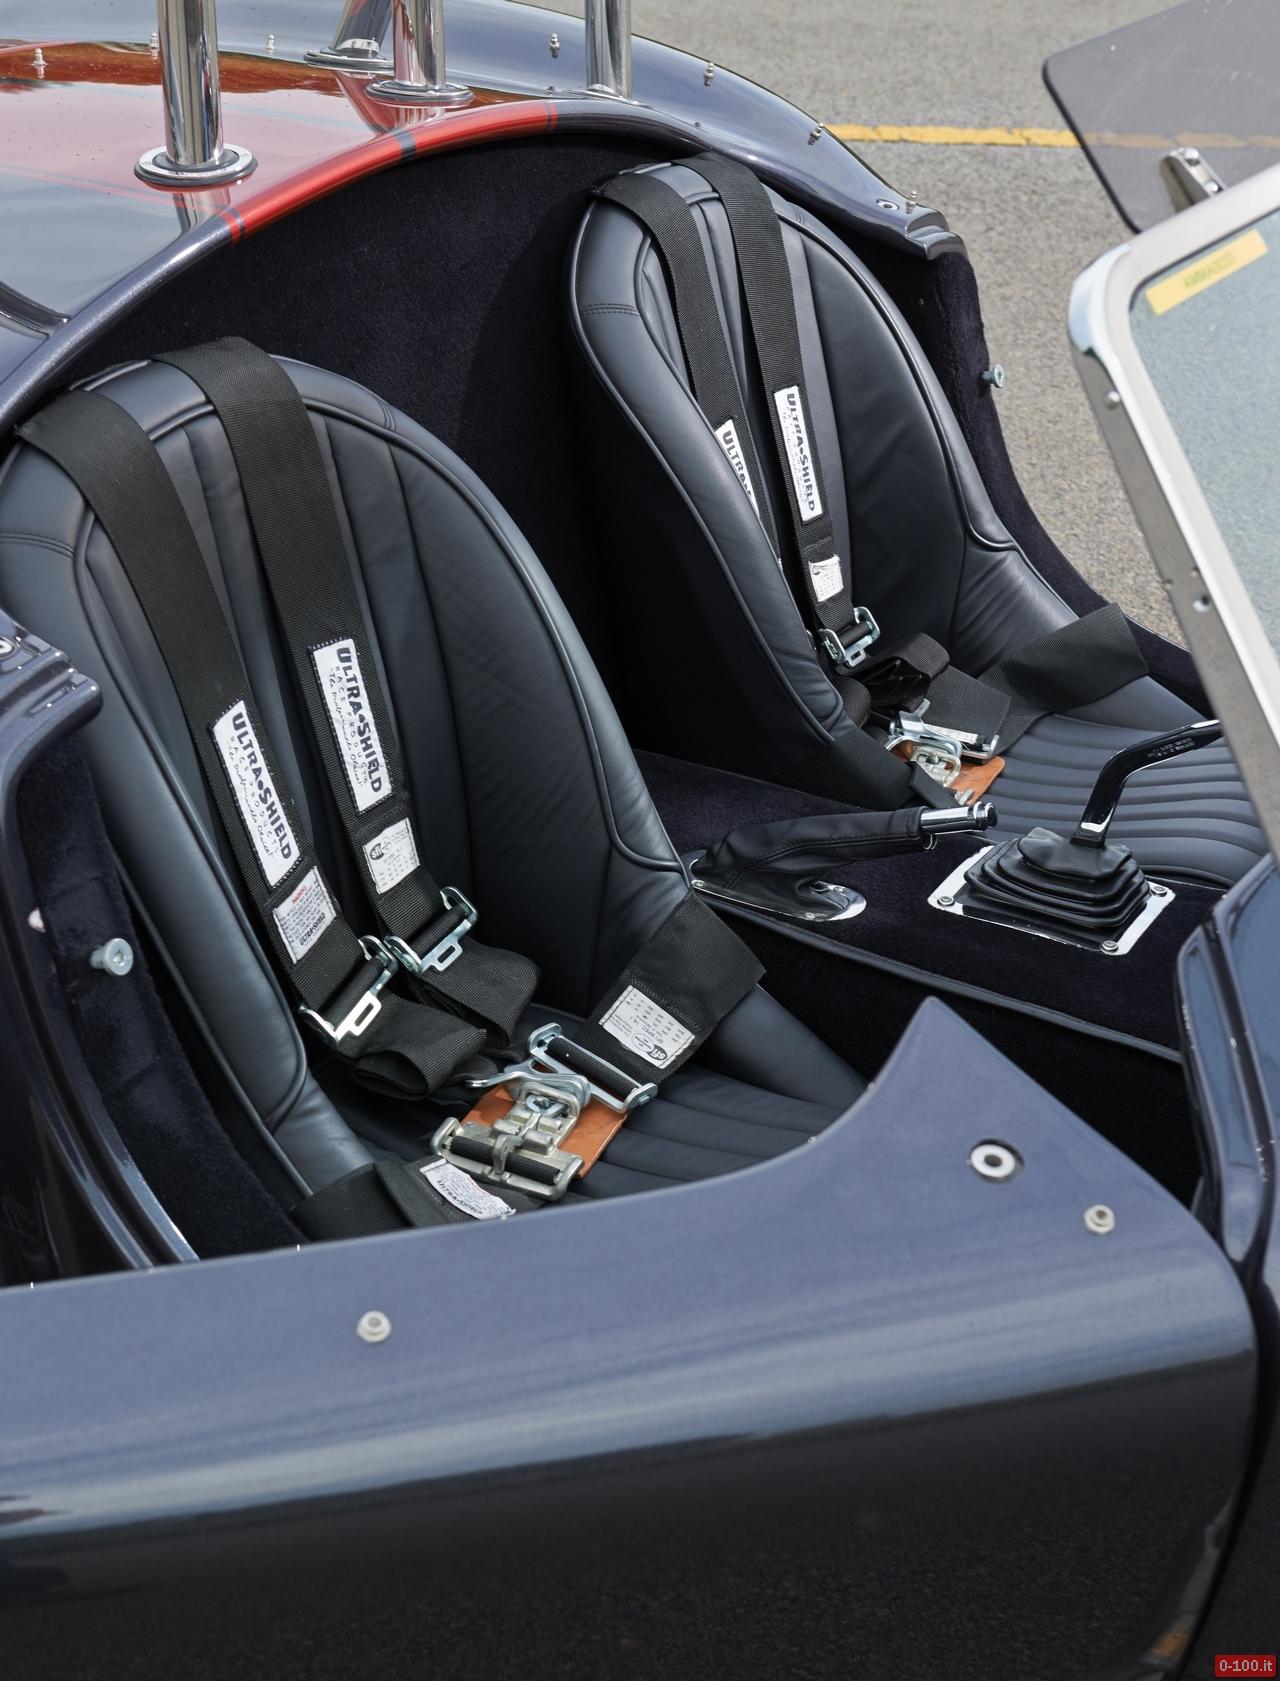 rm-auctions-a-retromobile-2014-weineck-cobra-780-cui-limited-edition-0-100_15